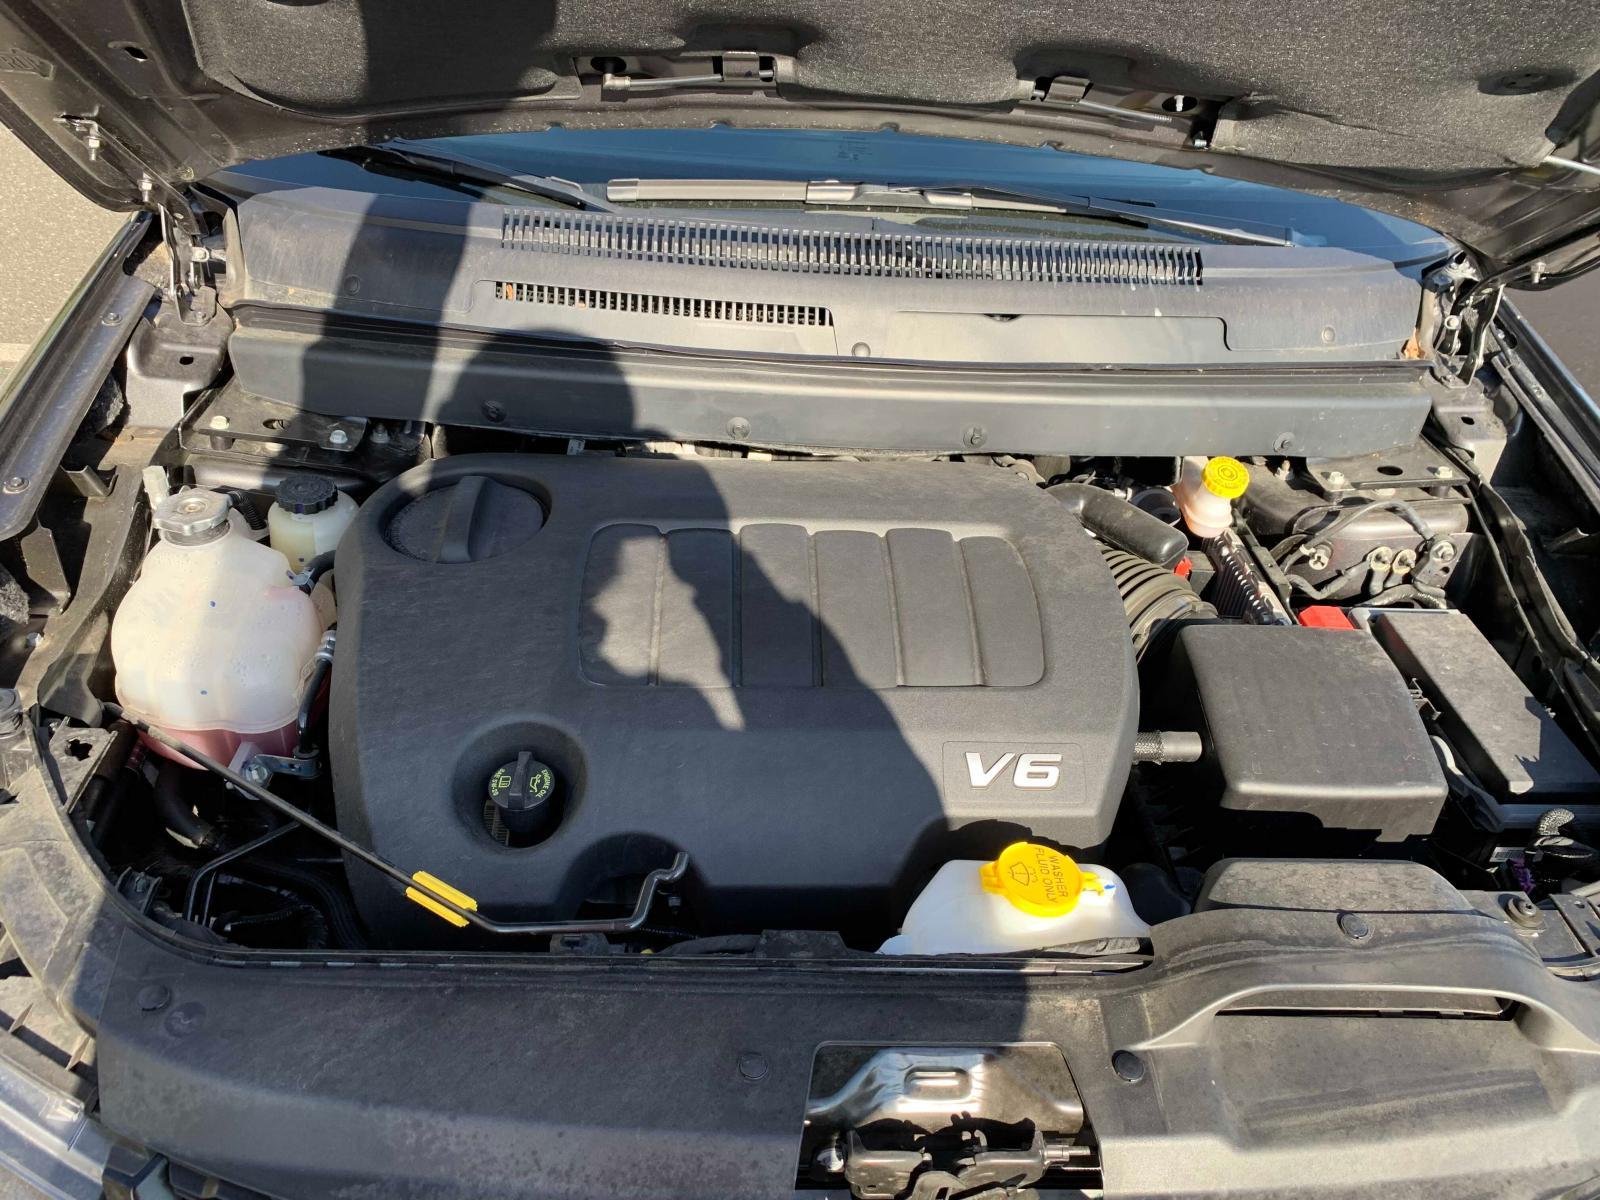 3C4PDCBG1KT804795 - 2019 Dodge Journey Se 3.6L inside view